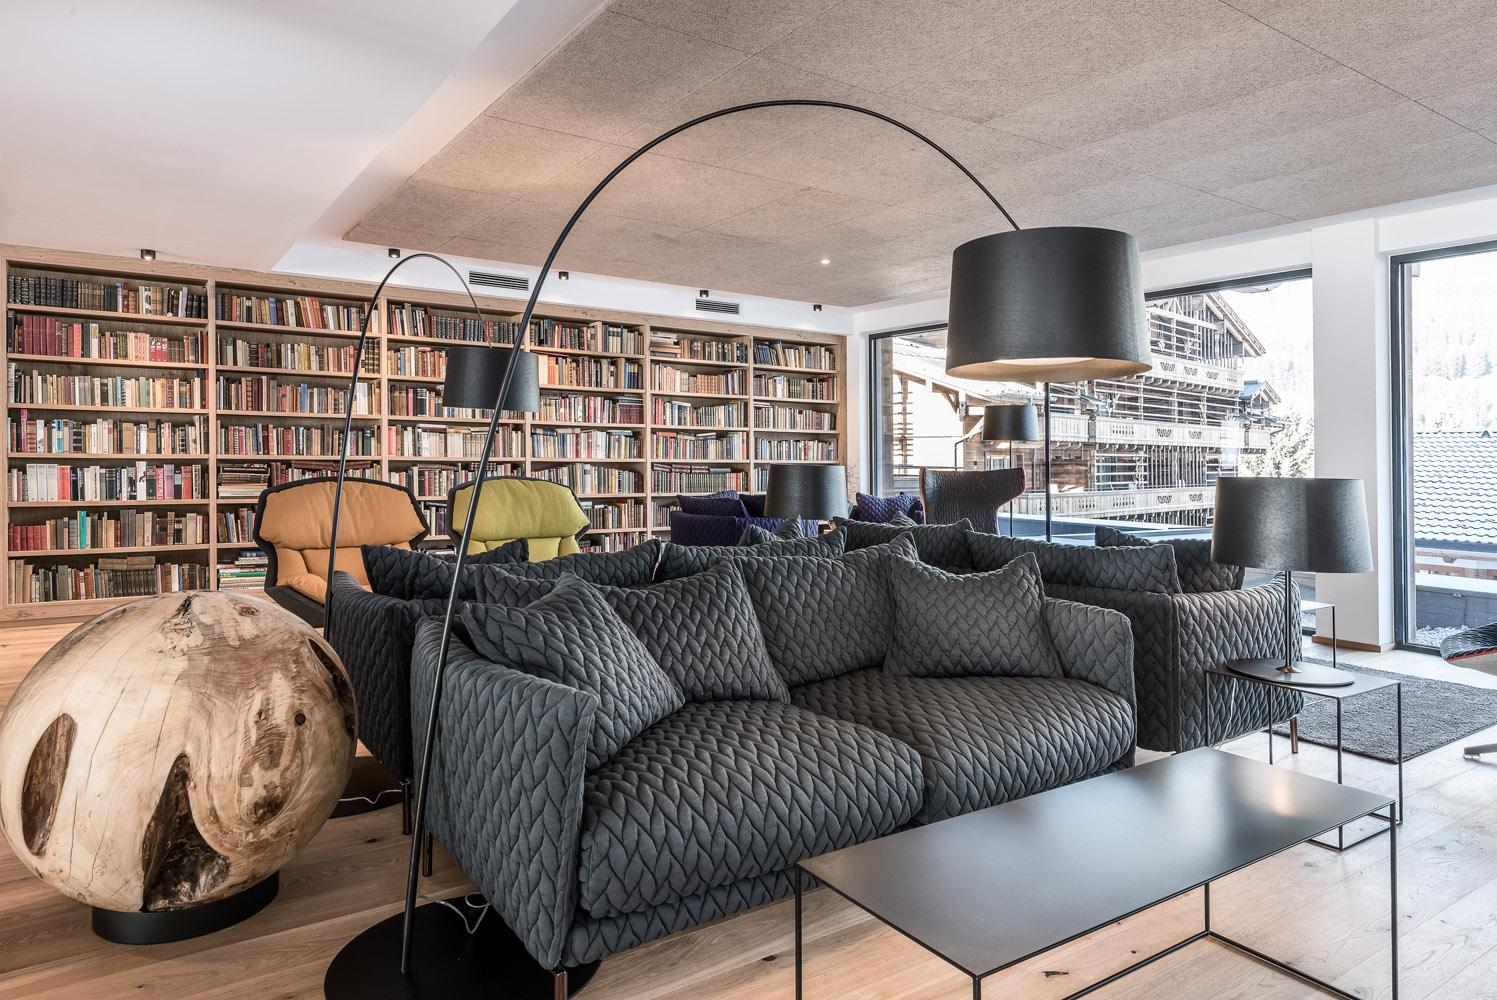 PURADIES Hotel & Chalets | Bibliothek 90 m²